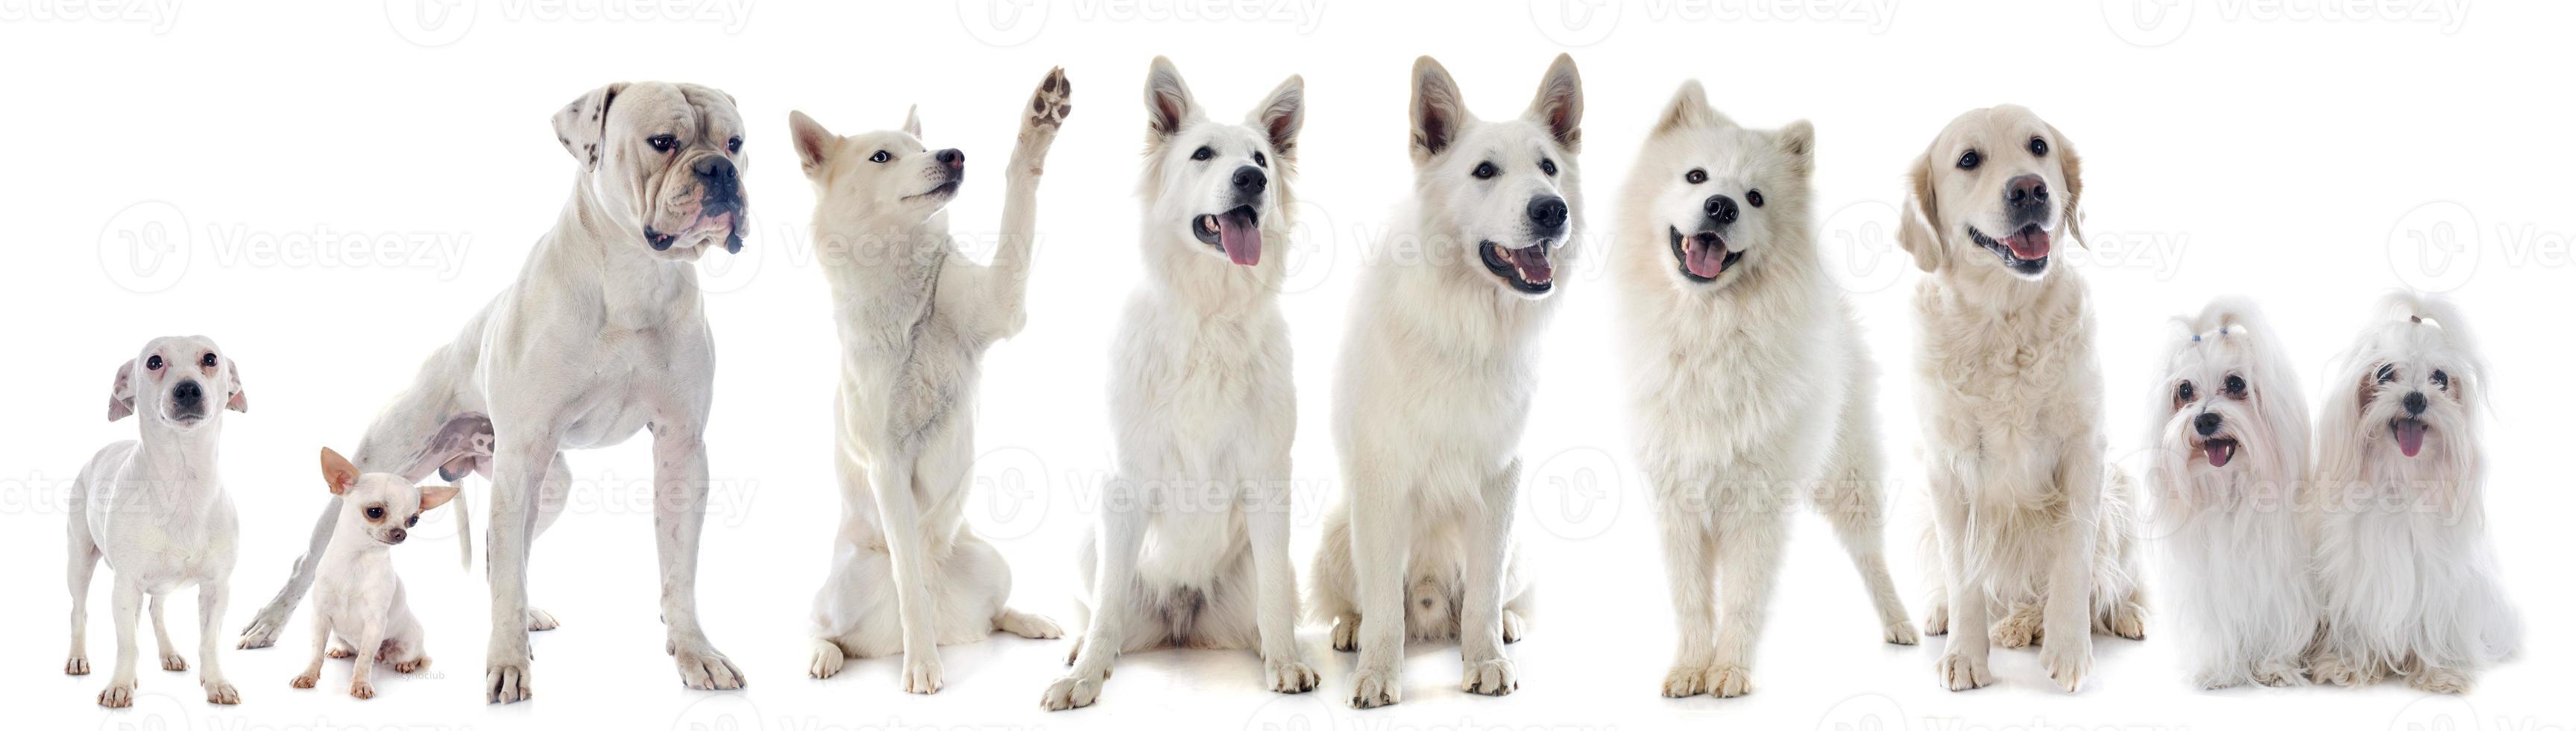 cães brancos foto